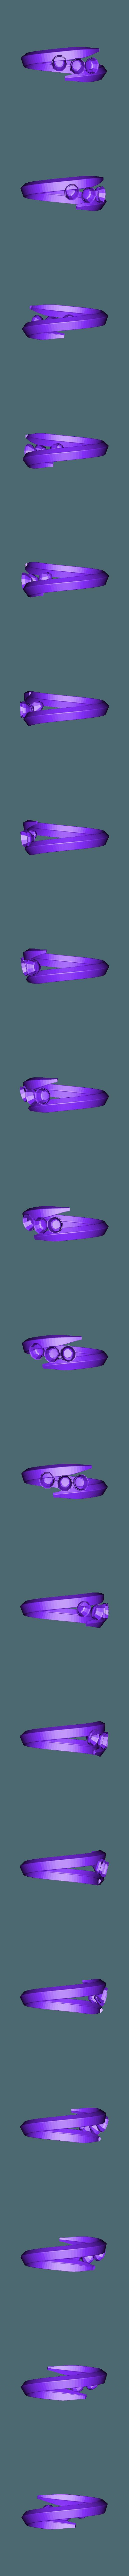 ring1.stl Download free STL file 3 diamond ring • Object to 3D print, swivaller